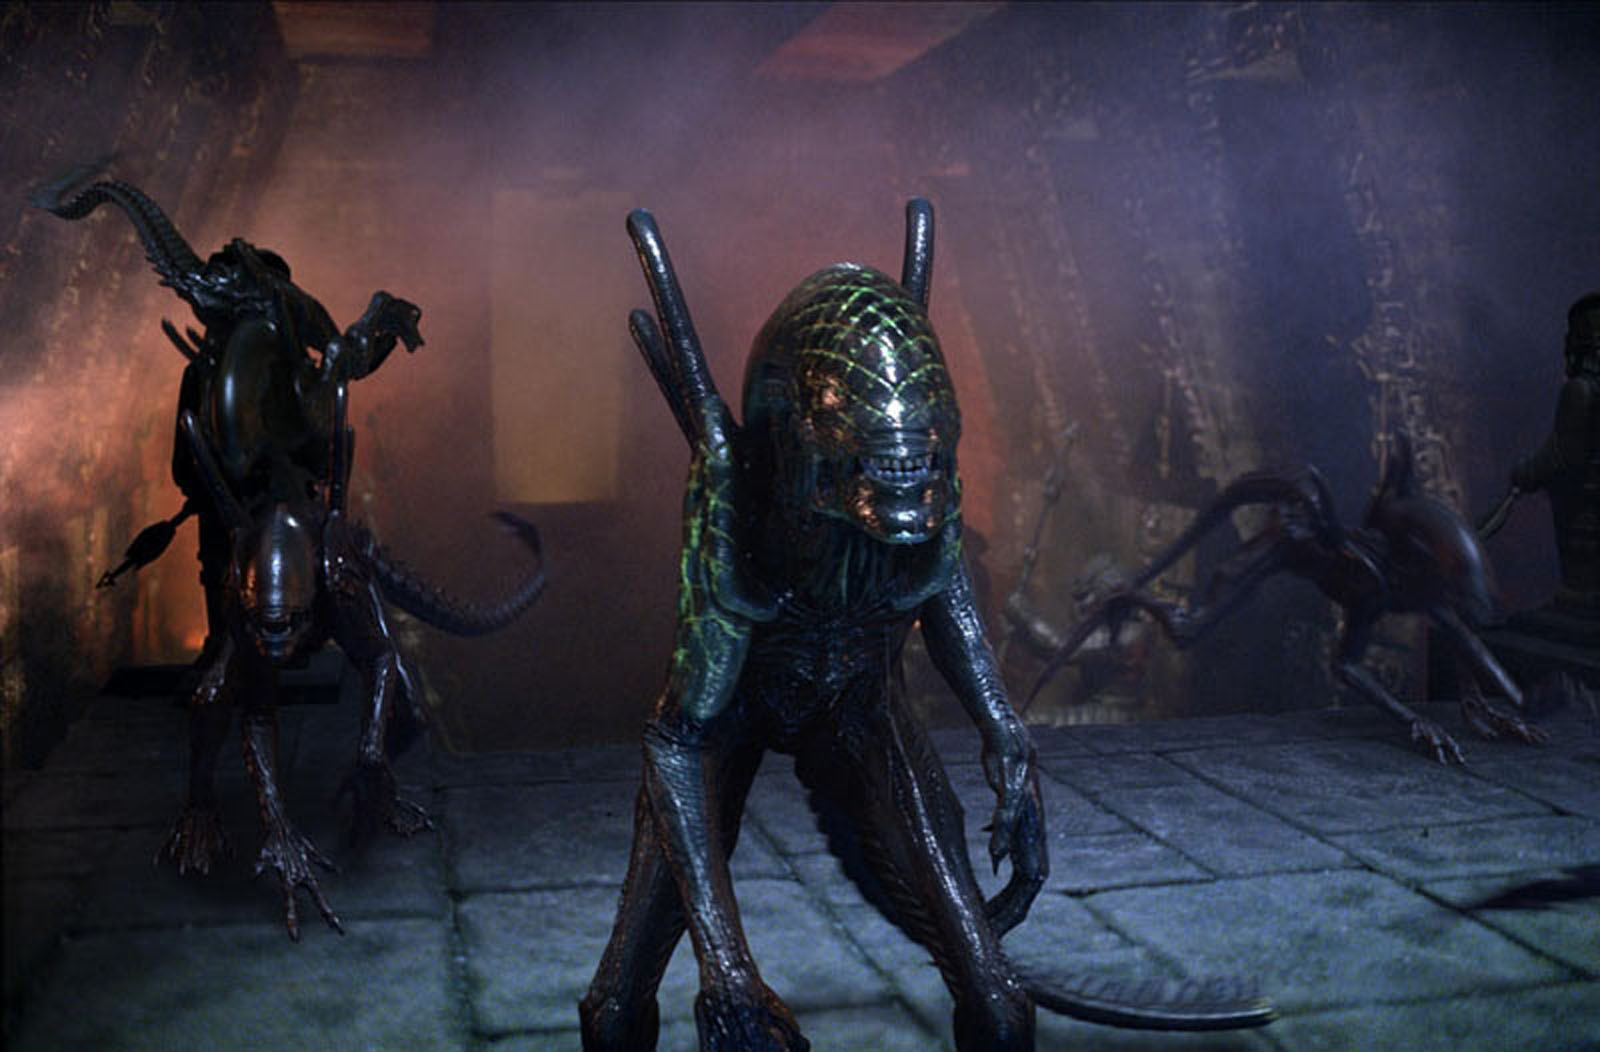 avp: alien vs. predator wallpaper and background image | 1600x1052